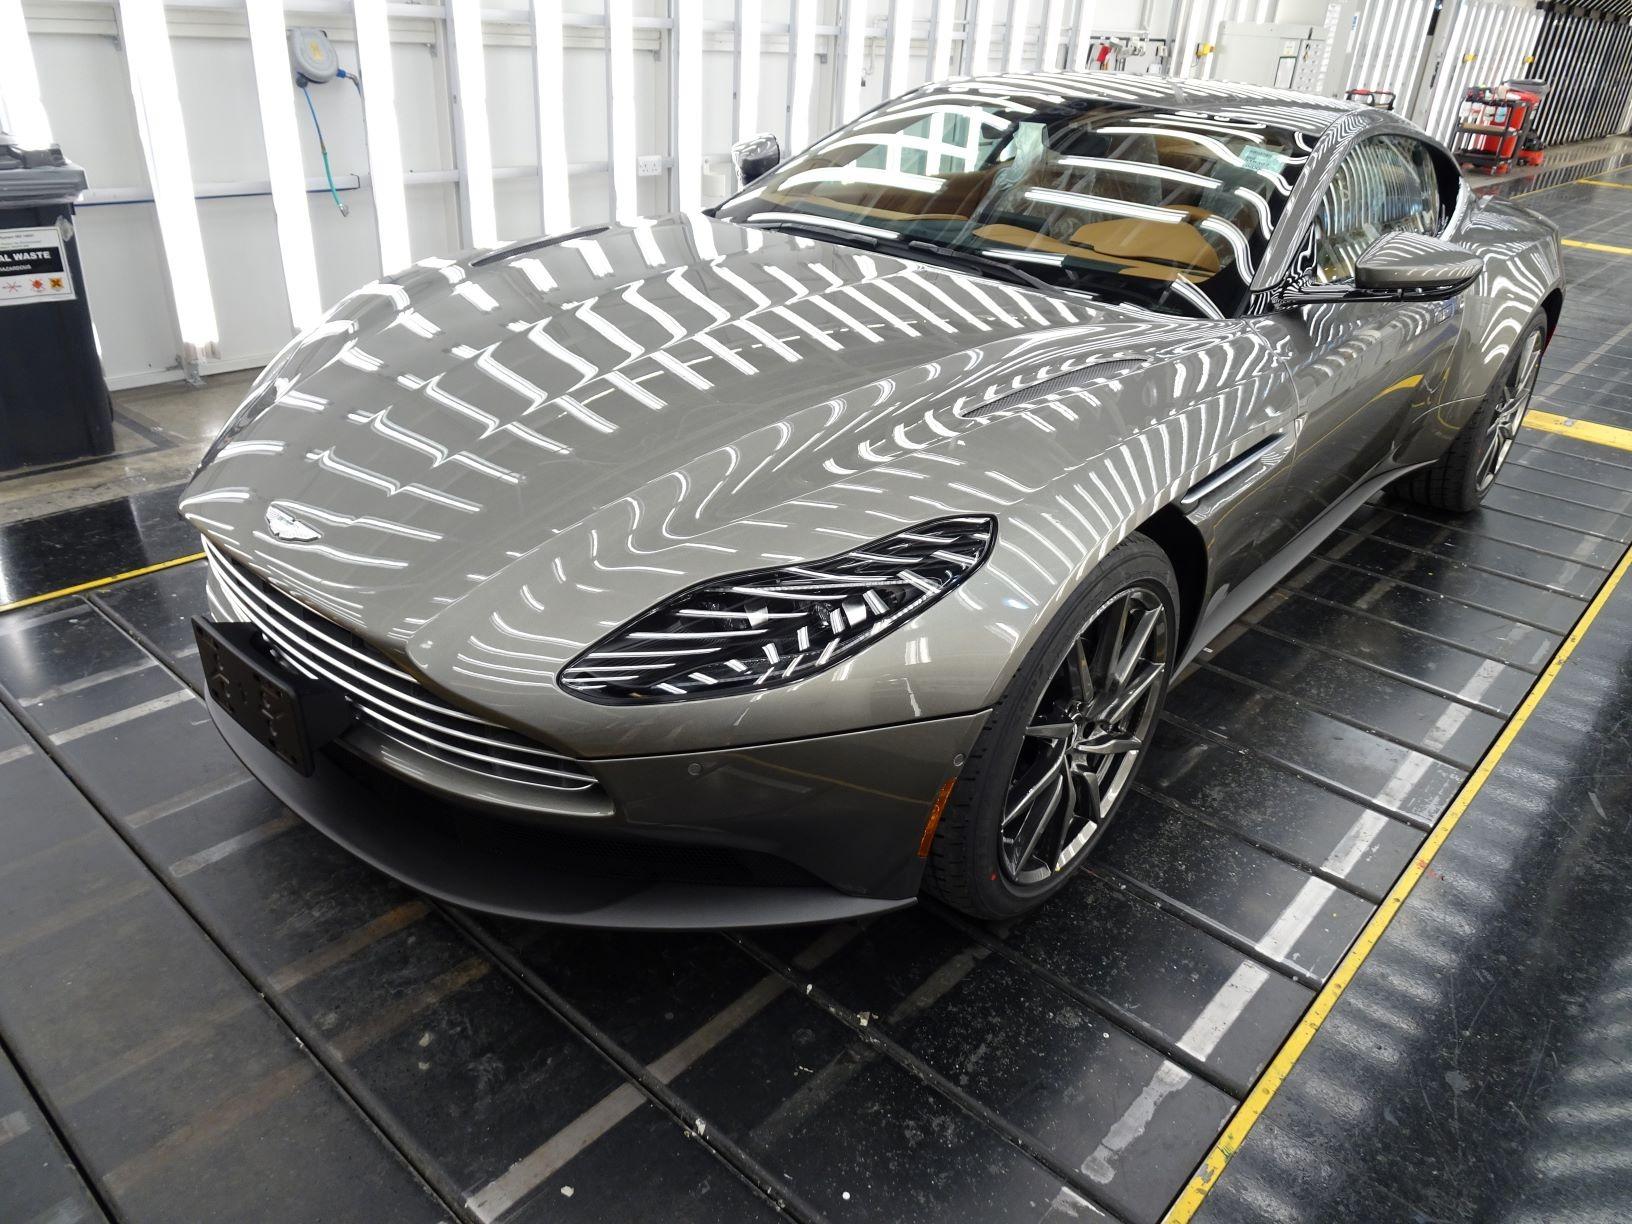 New 2021 Aston Martin DB11 V8 for sale $240,886 at Alfa Romeo of Greenwich in Greenwich CT 06830 1